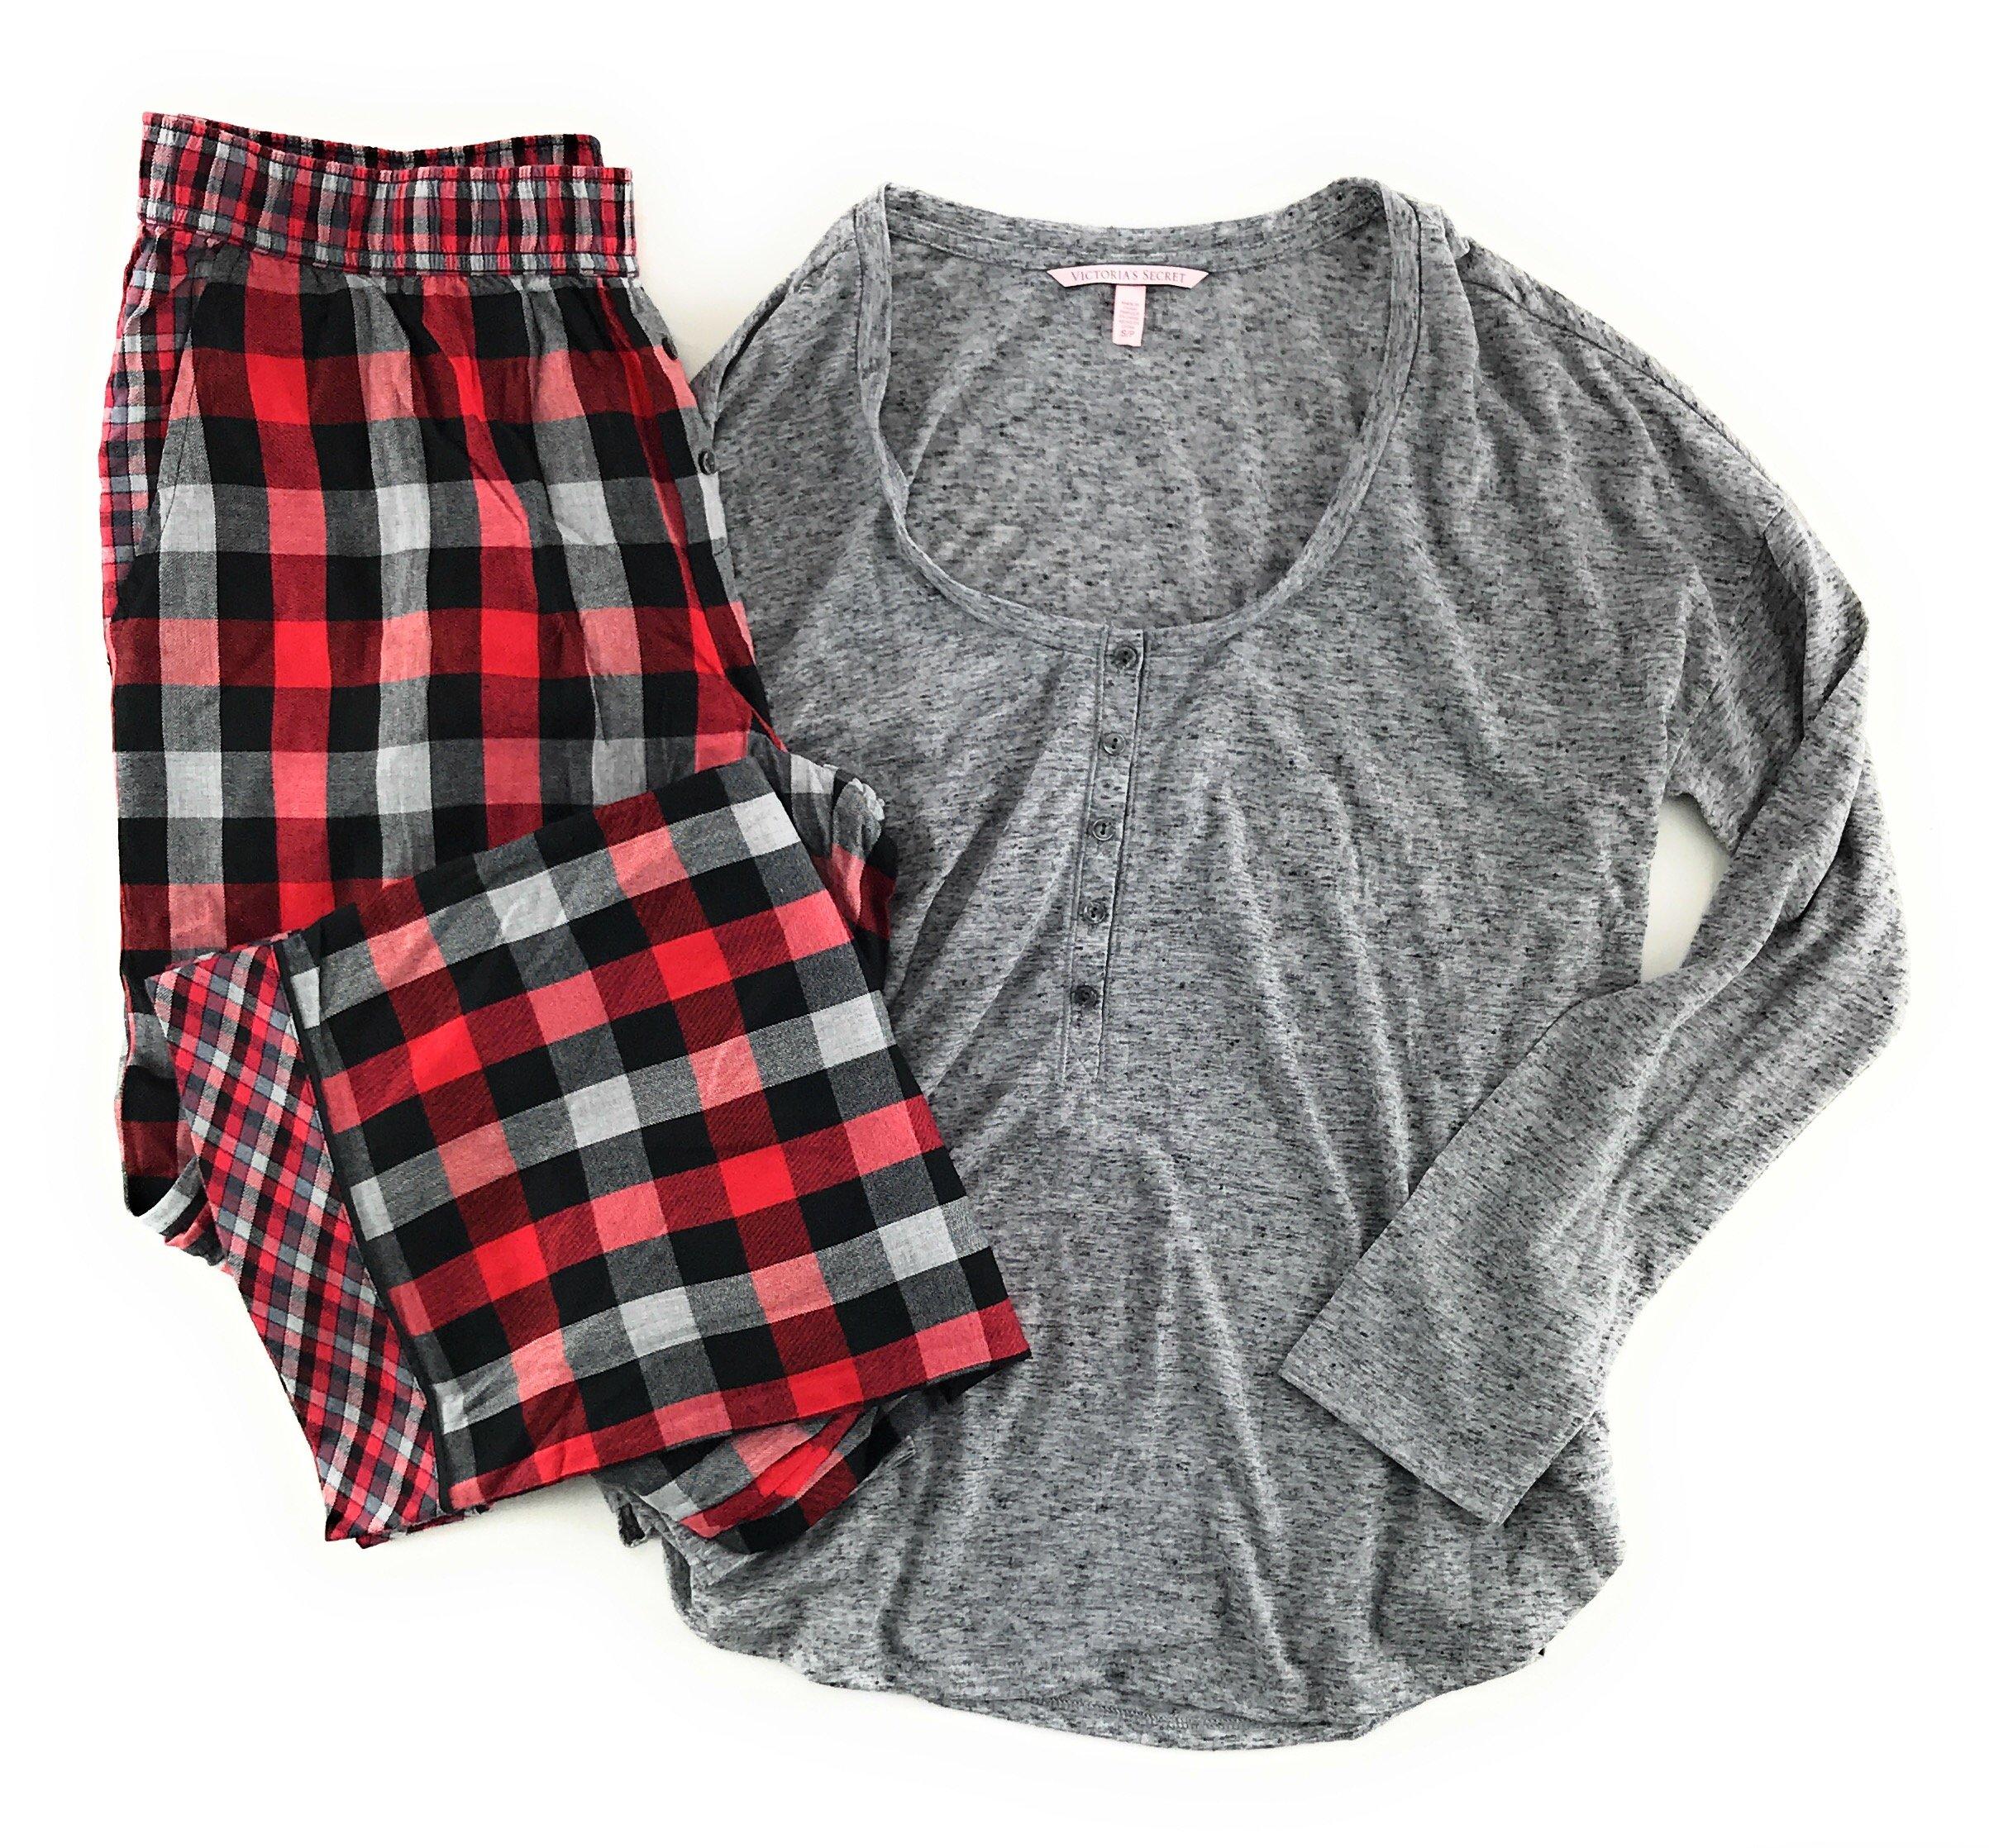 Victoria's Secret Dreamer Henley Pajama Set Light Gray/Red Black Gray Plaid Medium by Victoria's Secret (Image #2)